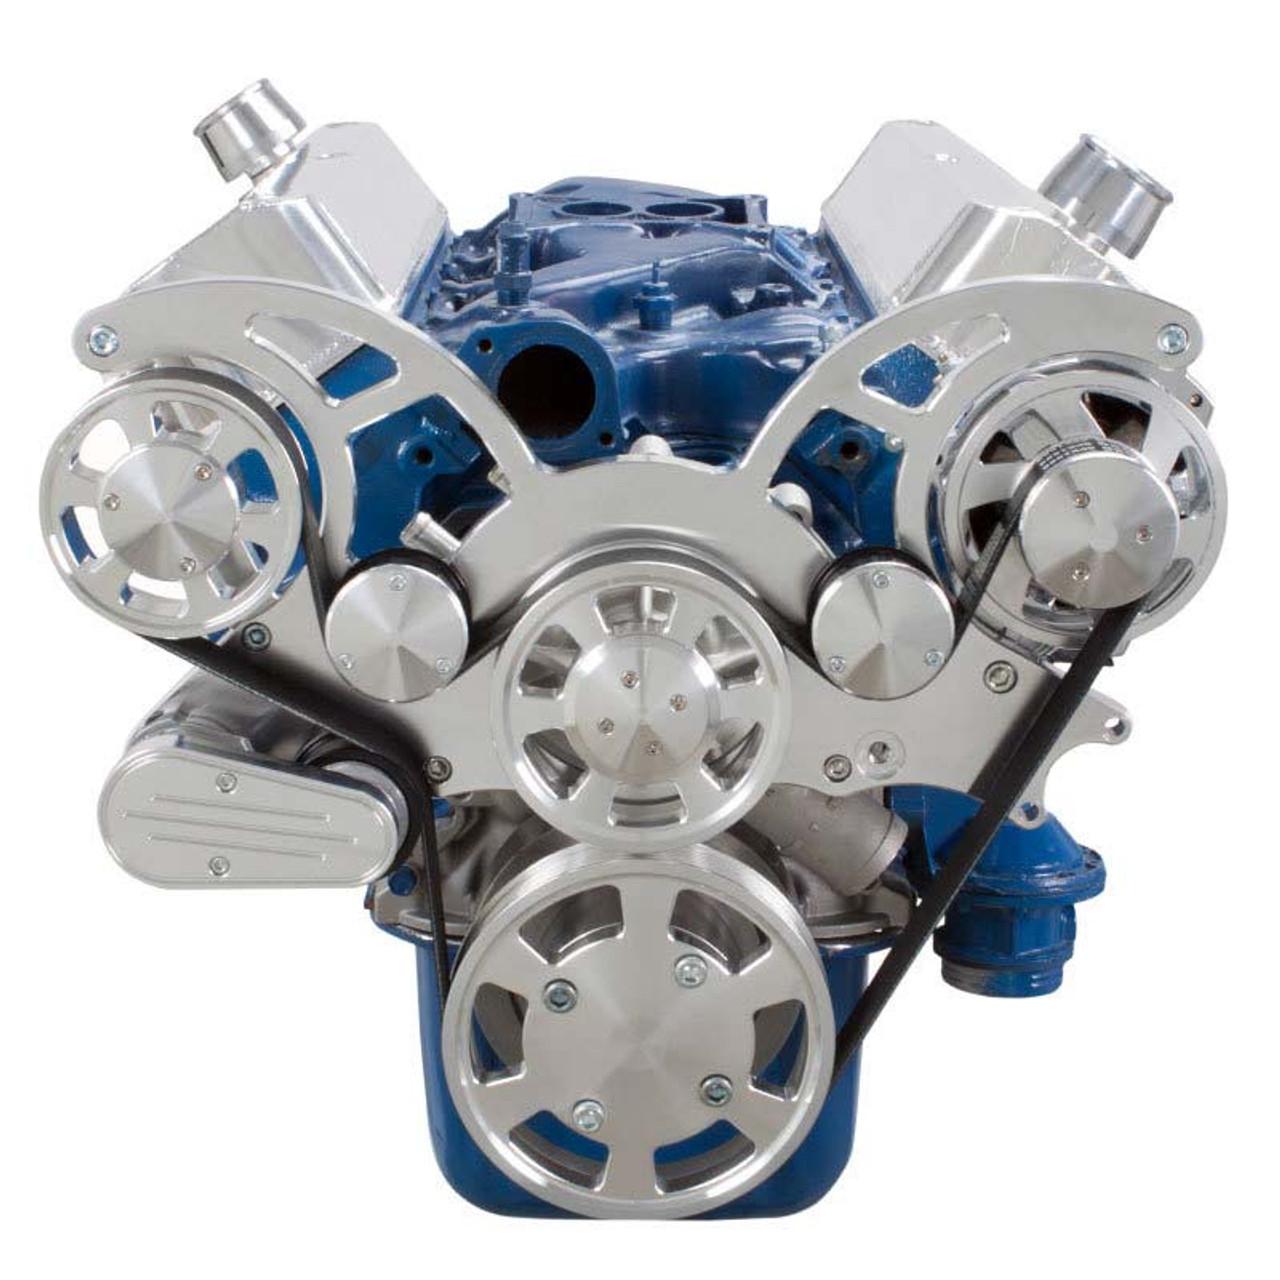 Ford 351 Alternator Wiring Diagram